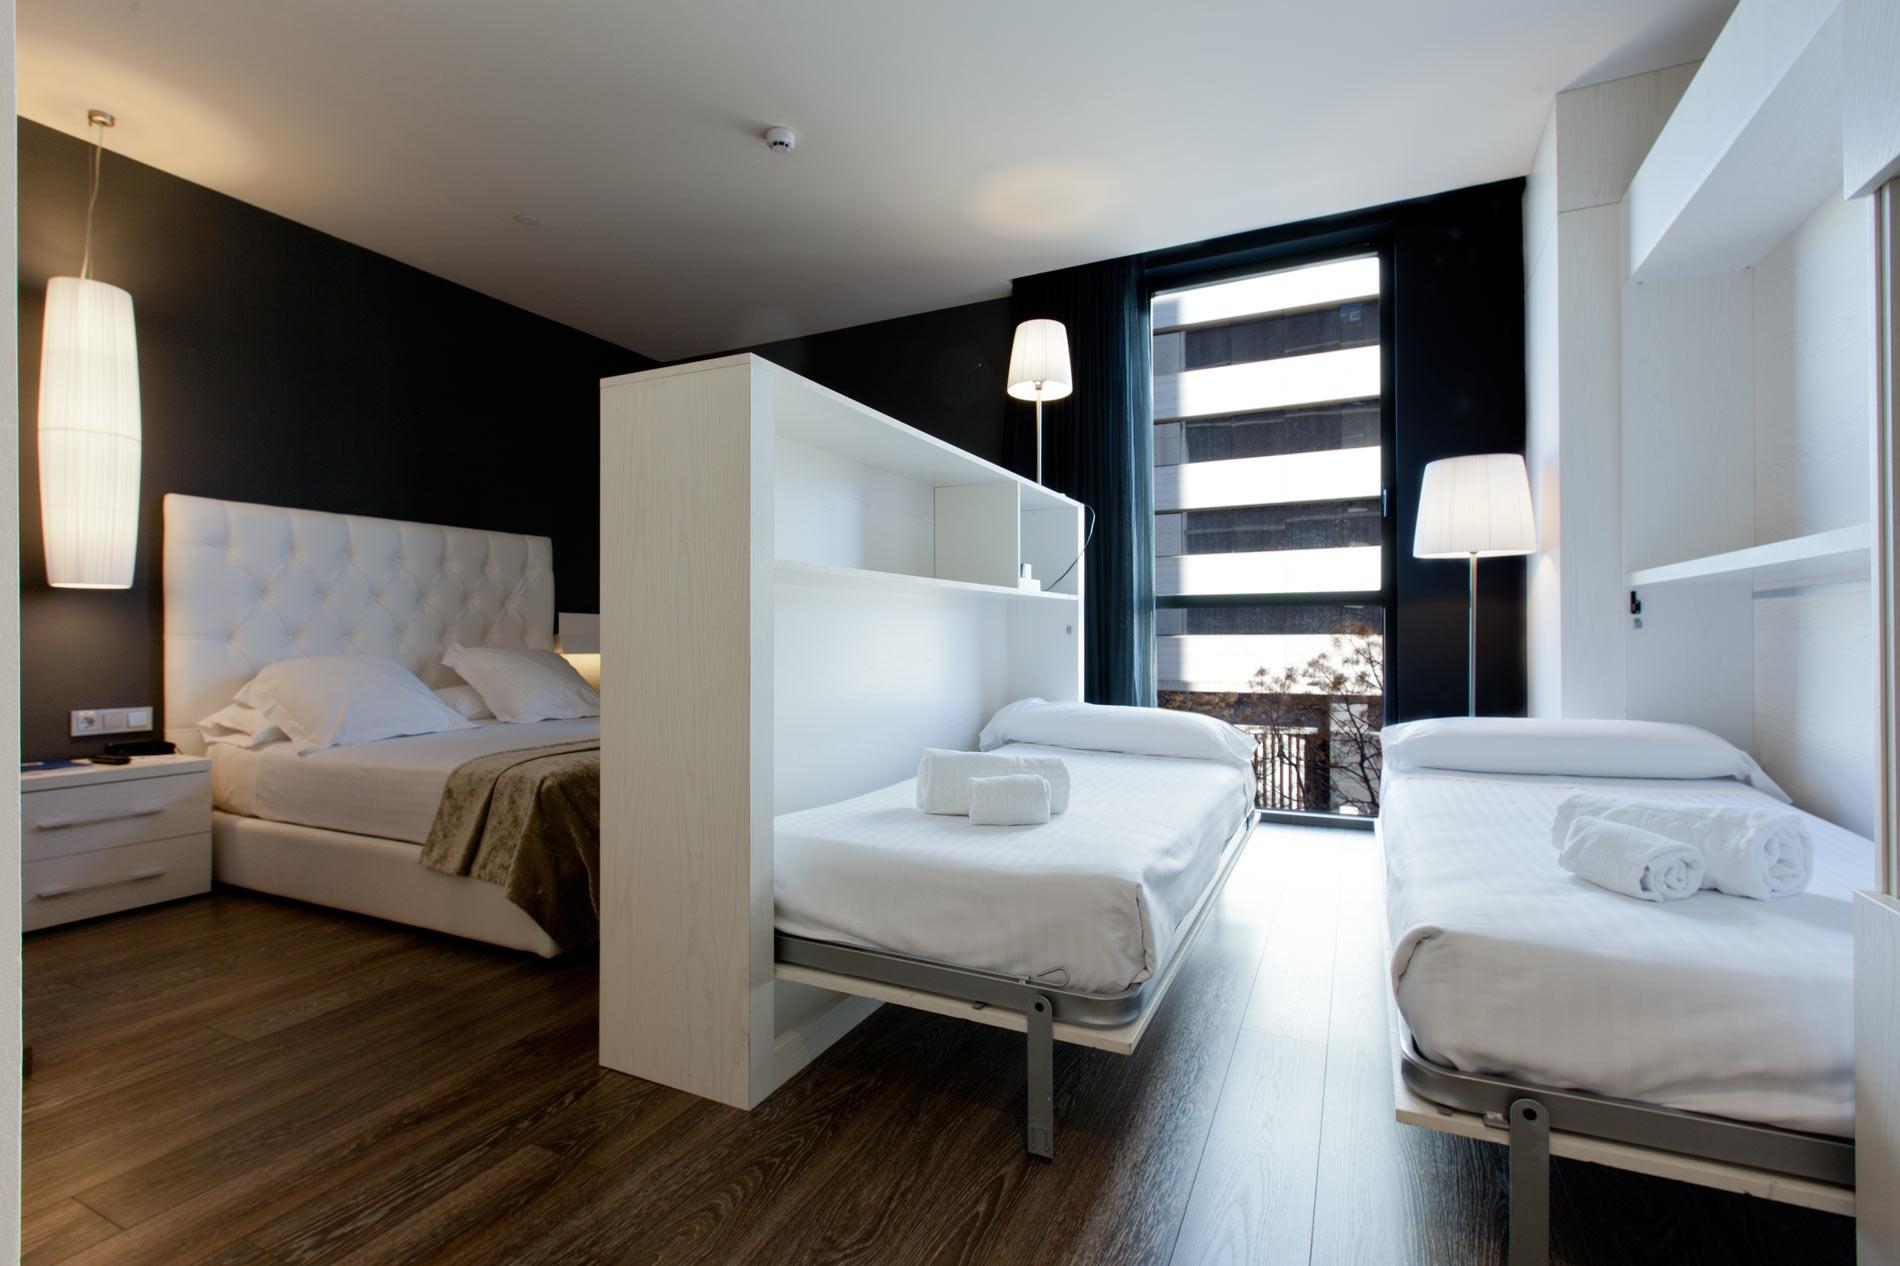 Vacanze con i bambini for Hotel barcelona habitacion familiar